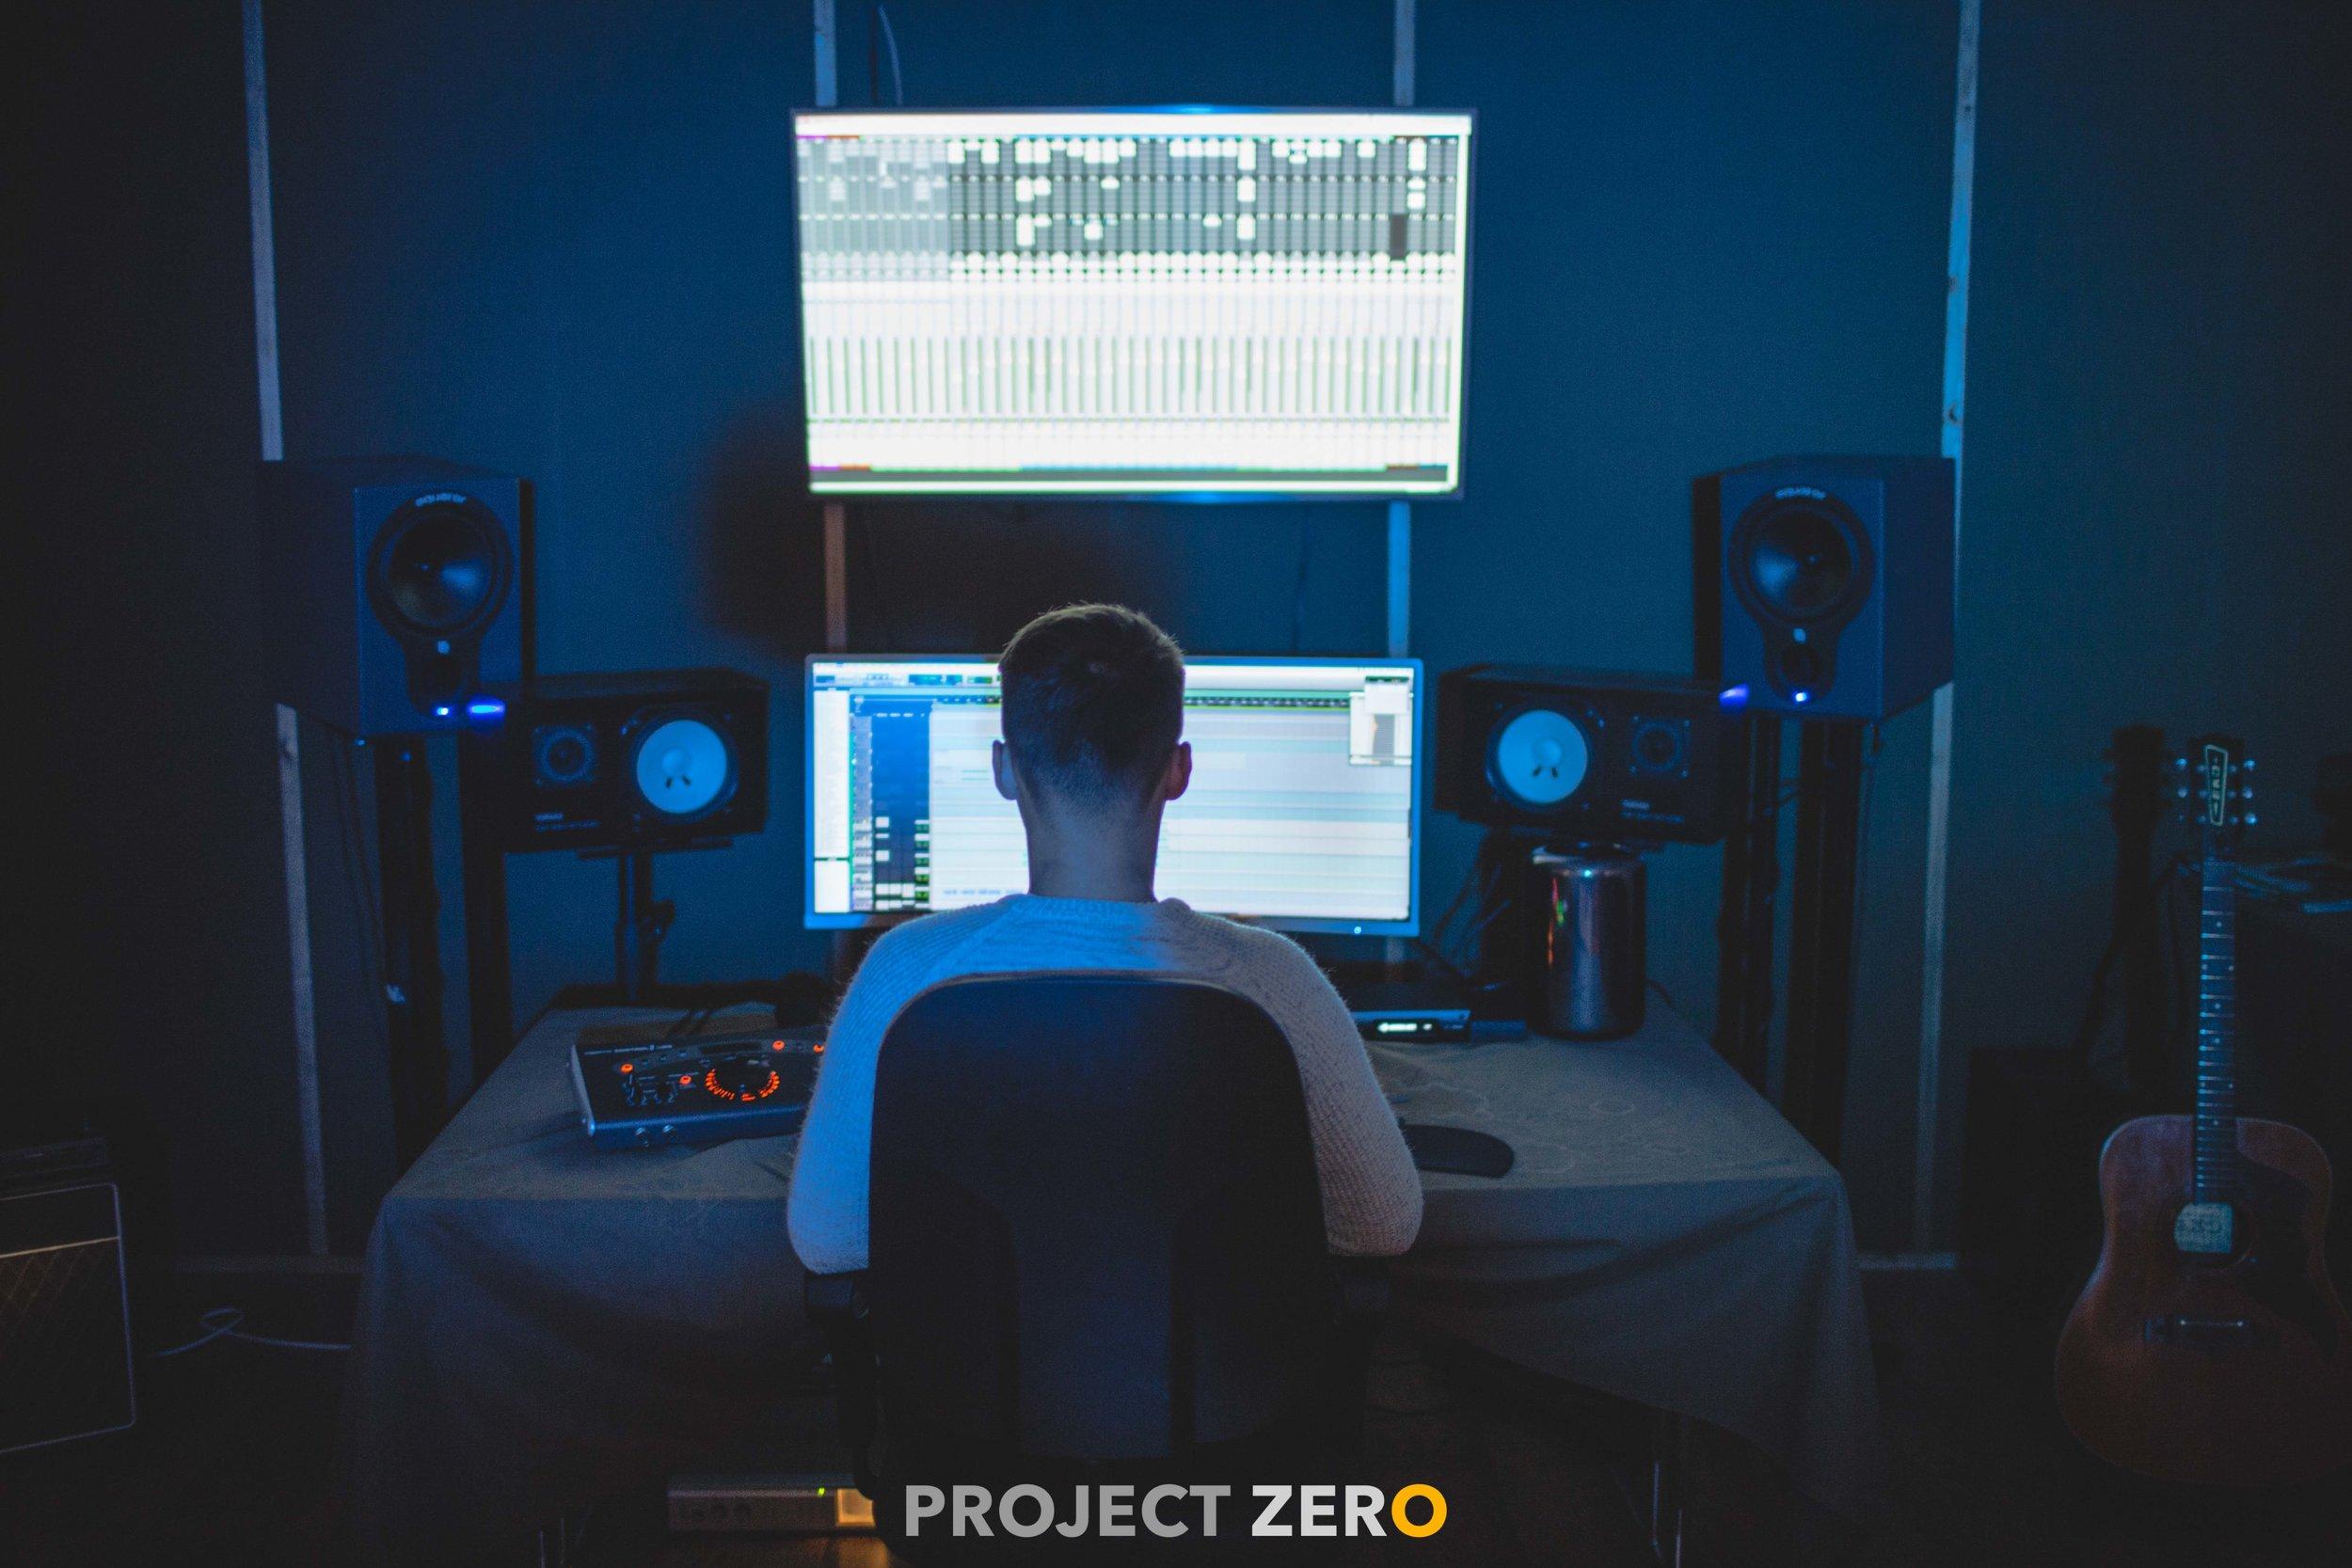 project-zero-12.jpg